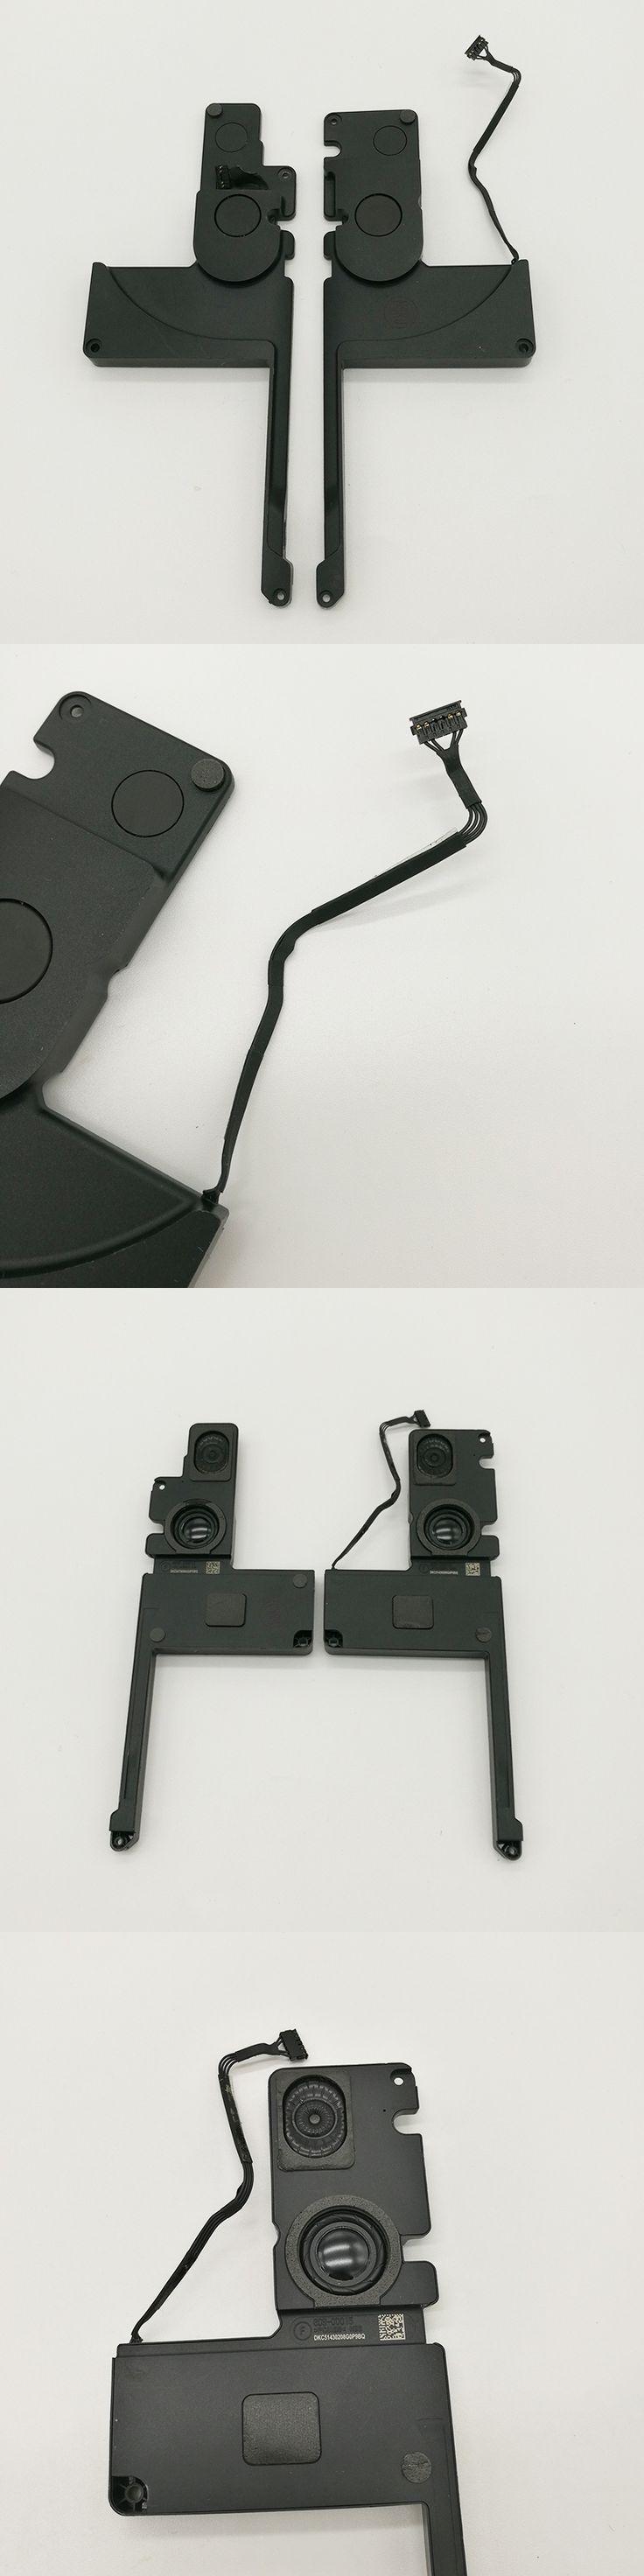 "New Left & Right Laptop Internal Speaker Speakers 923-0660 For MacBook Pro 15"" A1398 Retina 2012-2015"